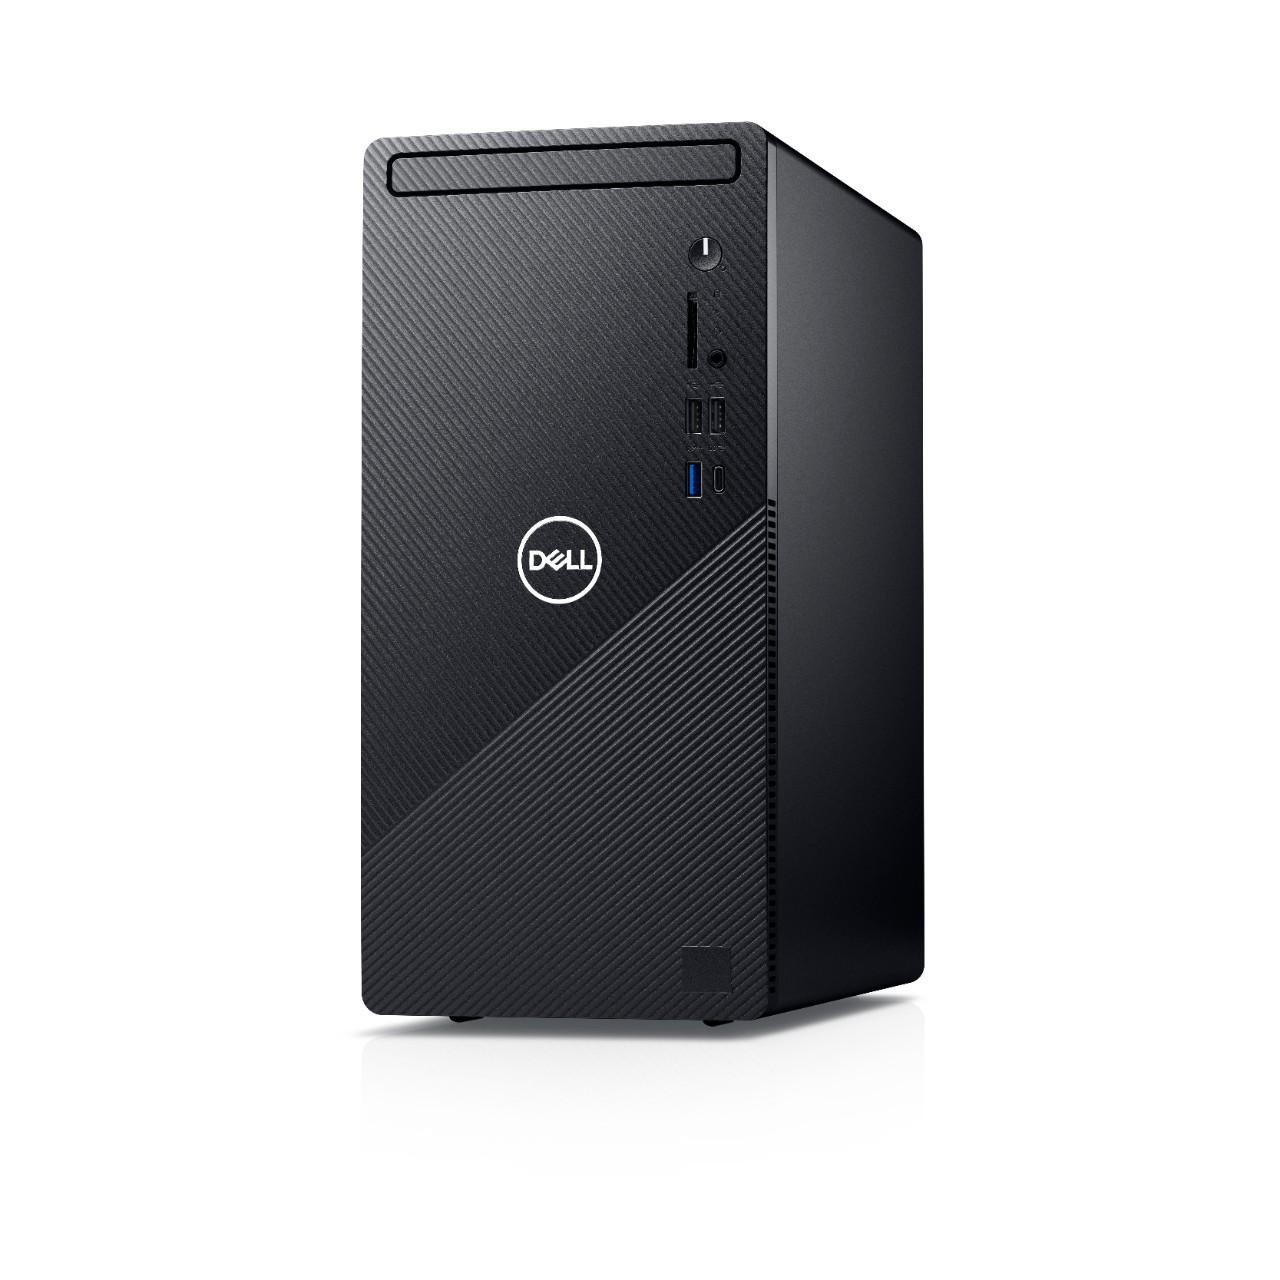 Dell Inspiron DT 3891 i7-10700F/8GB/512GB/DVD/1650-4GB/W10Home/2RNBD/Černý - D-3891-N2-701K